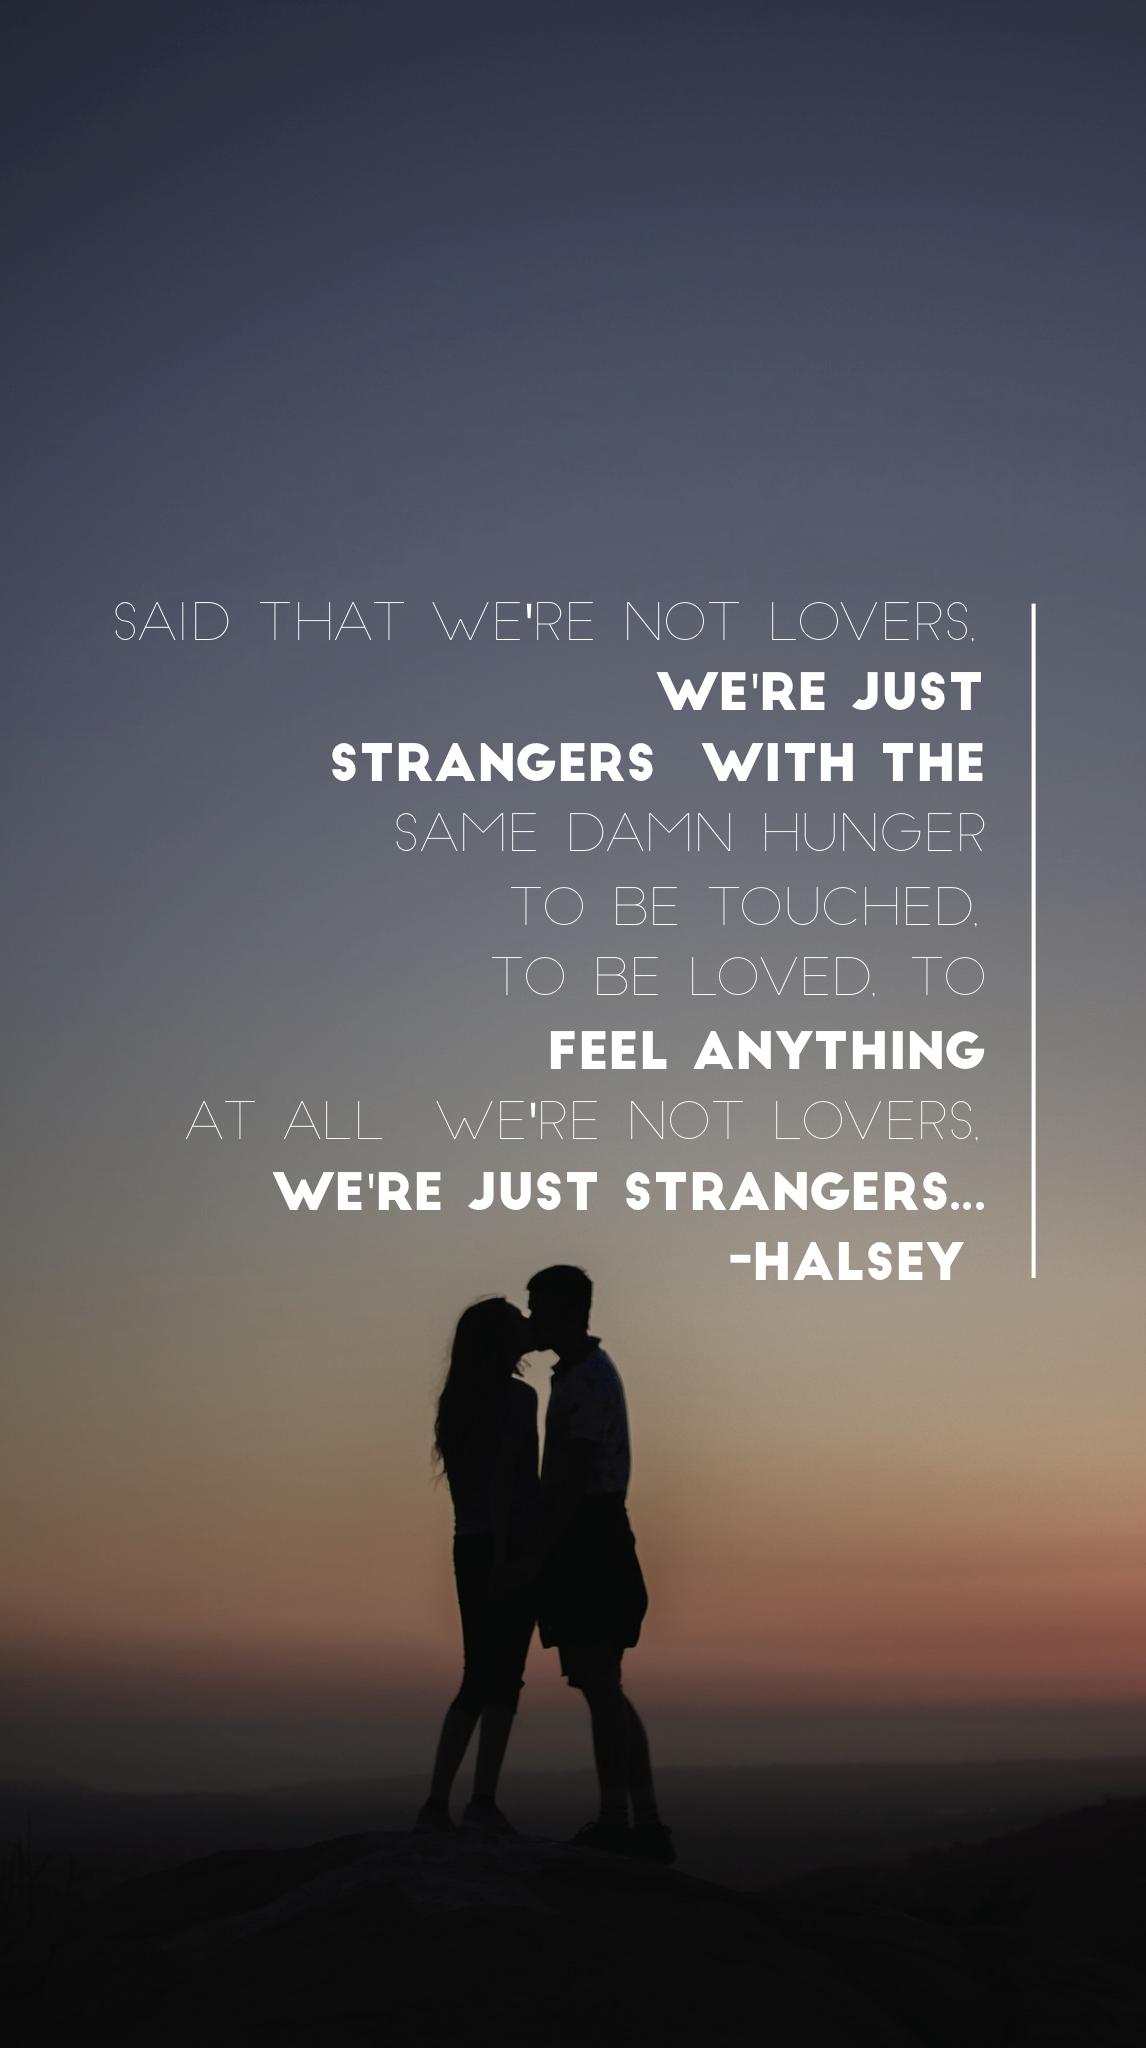 Halsey Quotes Strangers|Halsey Quotes/Lyrics Edit @EvaLand | HΔLSΞY | Halsey  Halsey Quotes